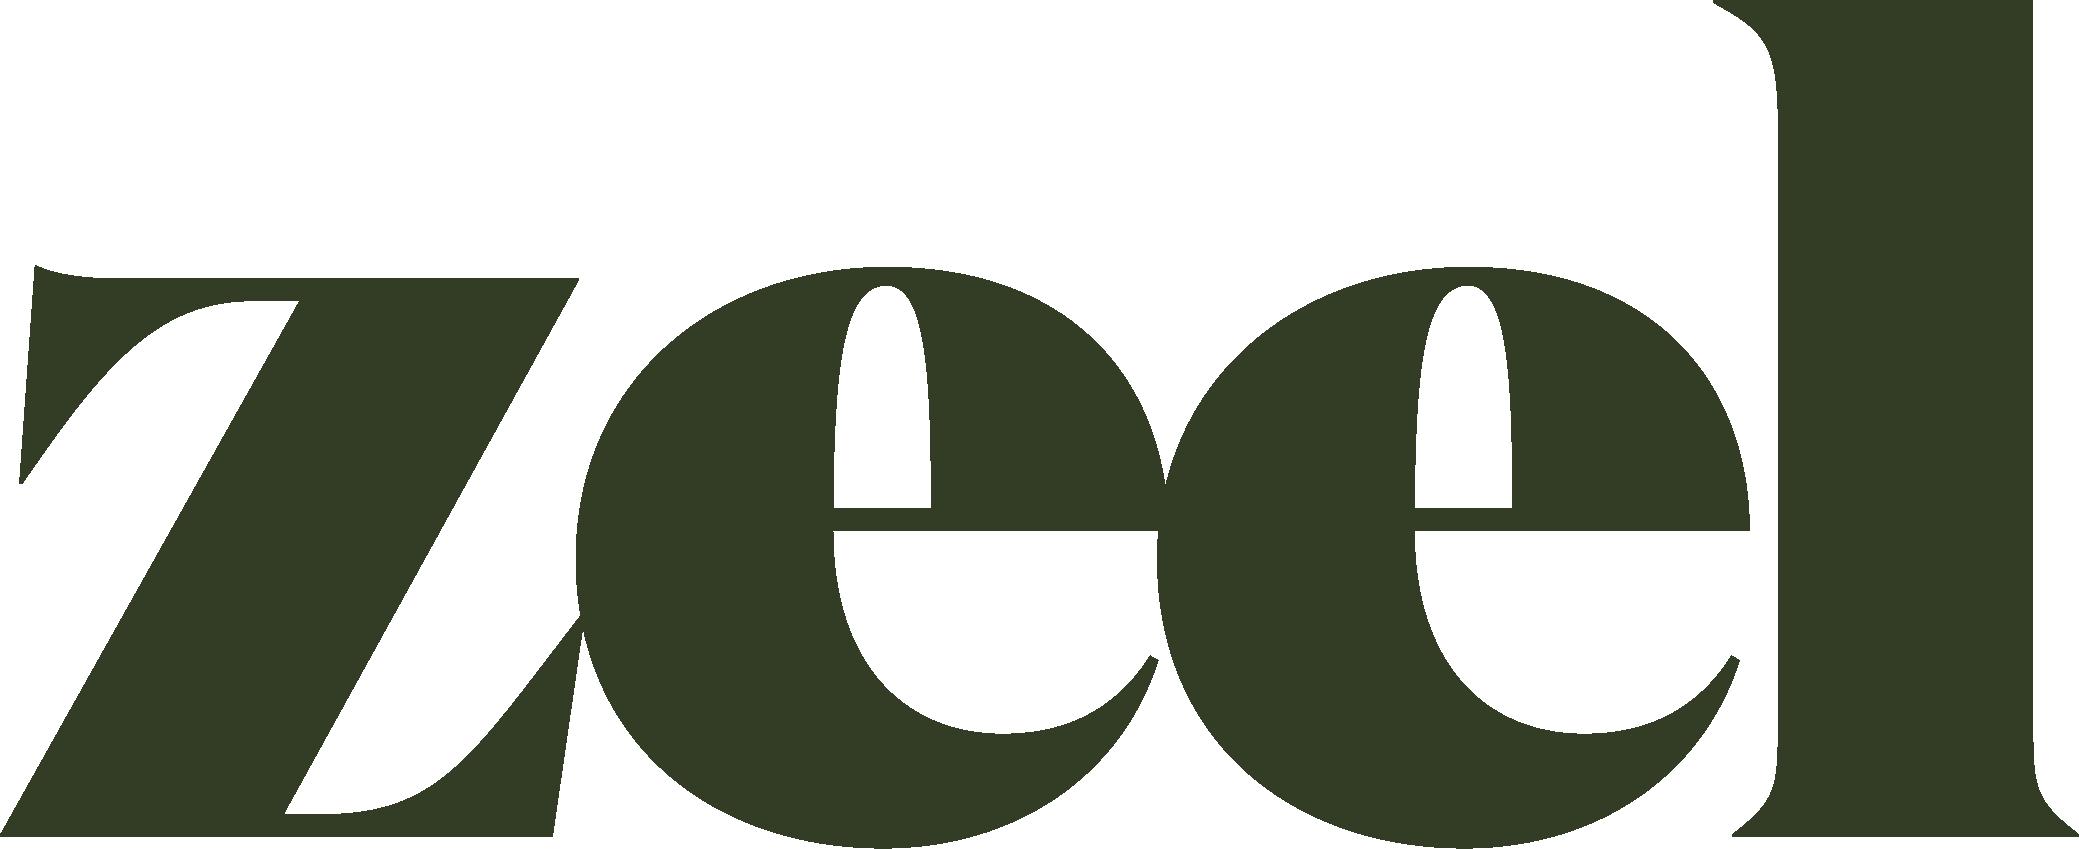 5bbe4a9f07dd5acde5c40e65_zeel logo_dark green_CMYK.png